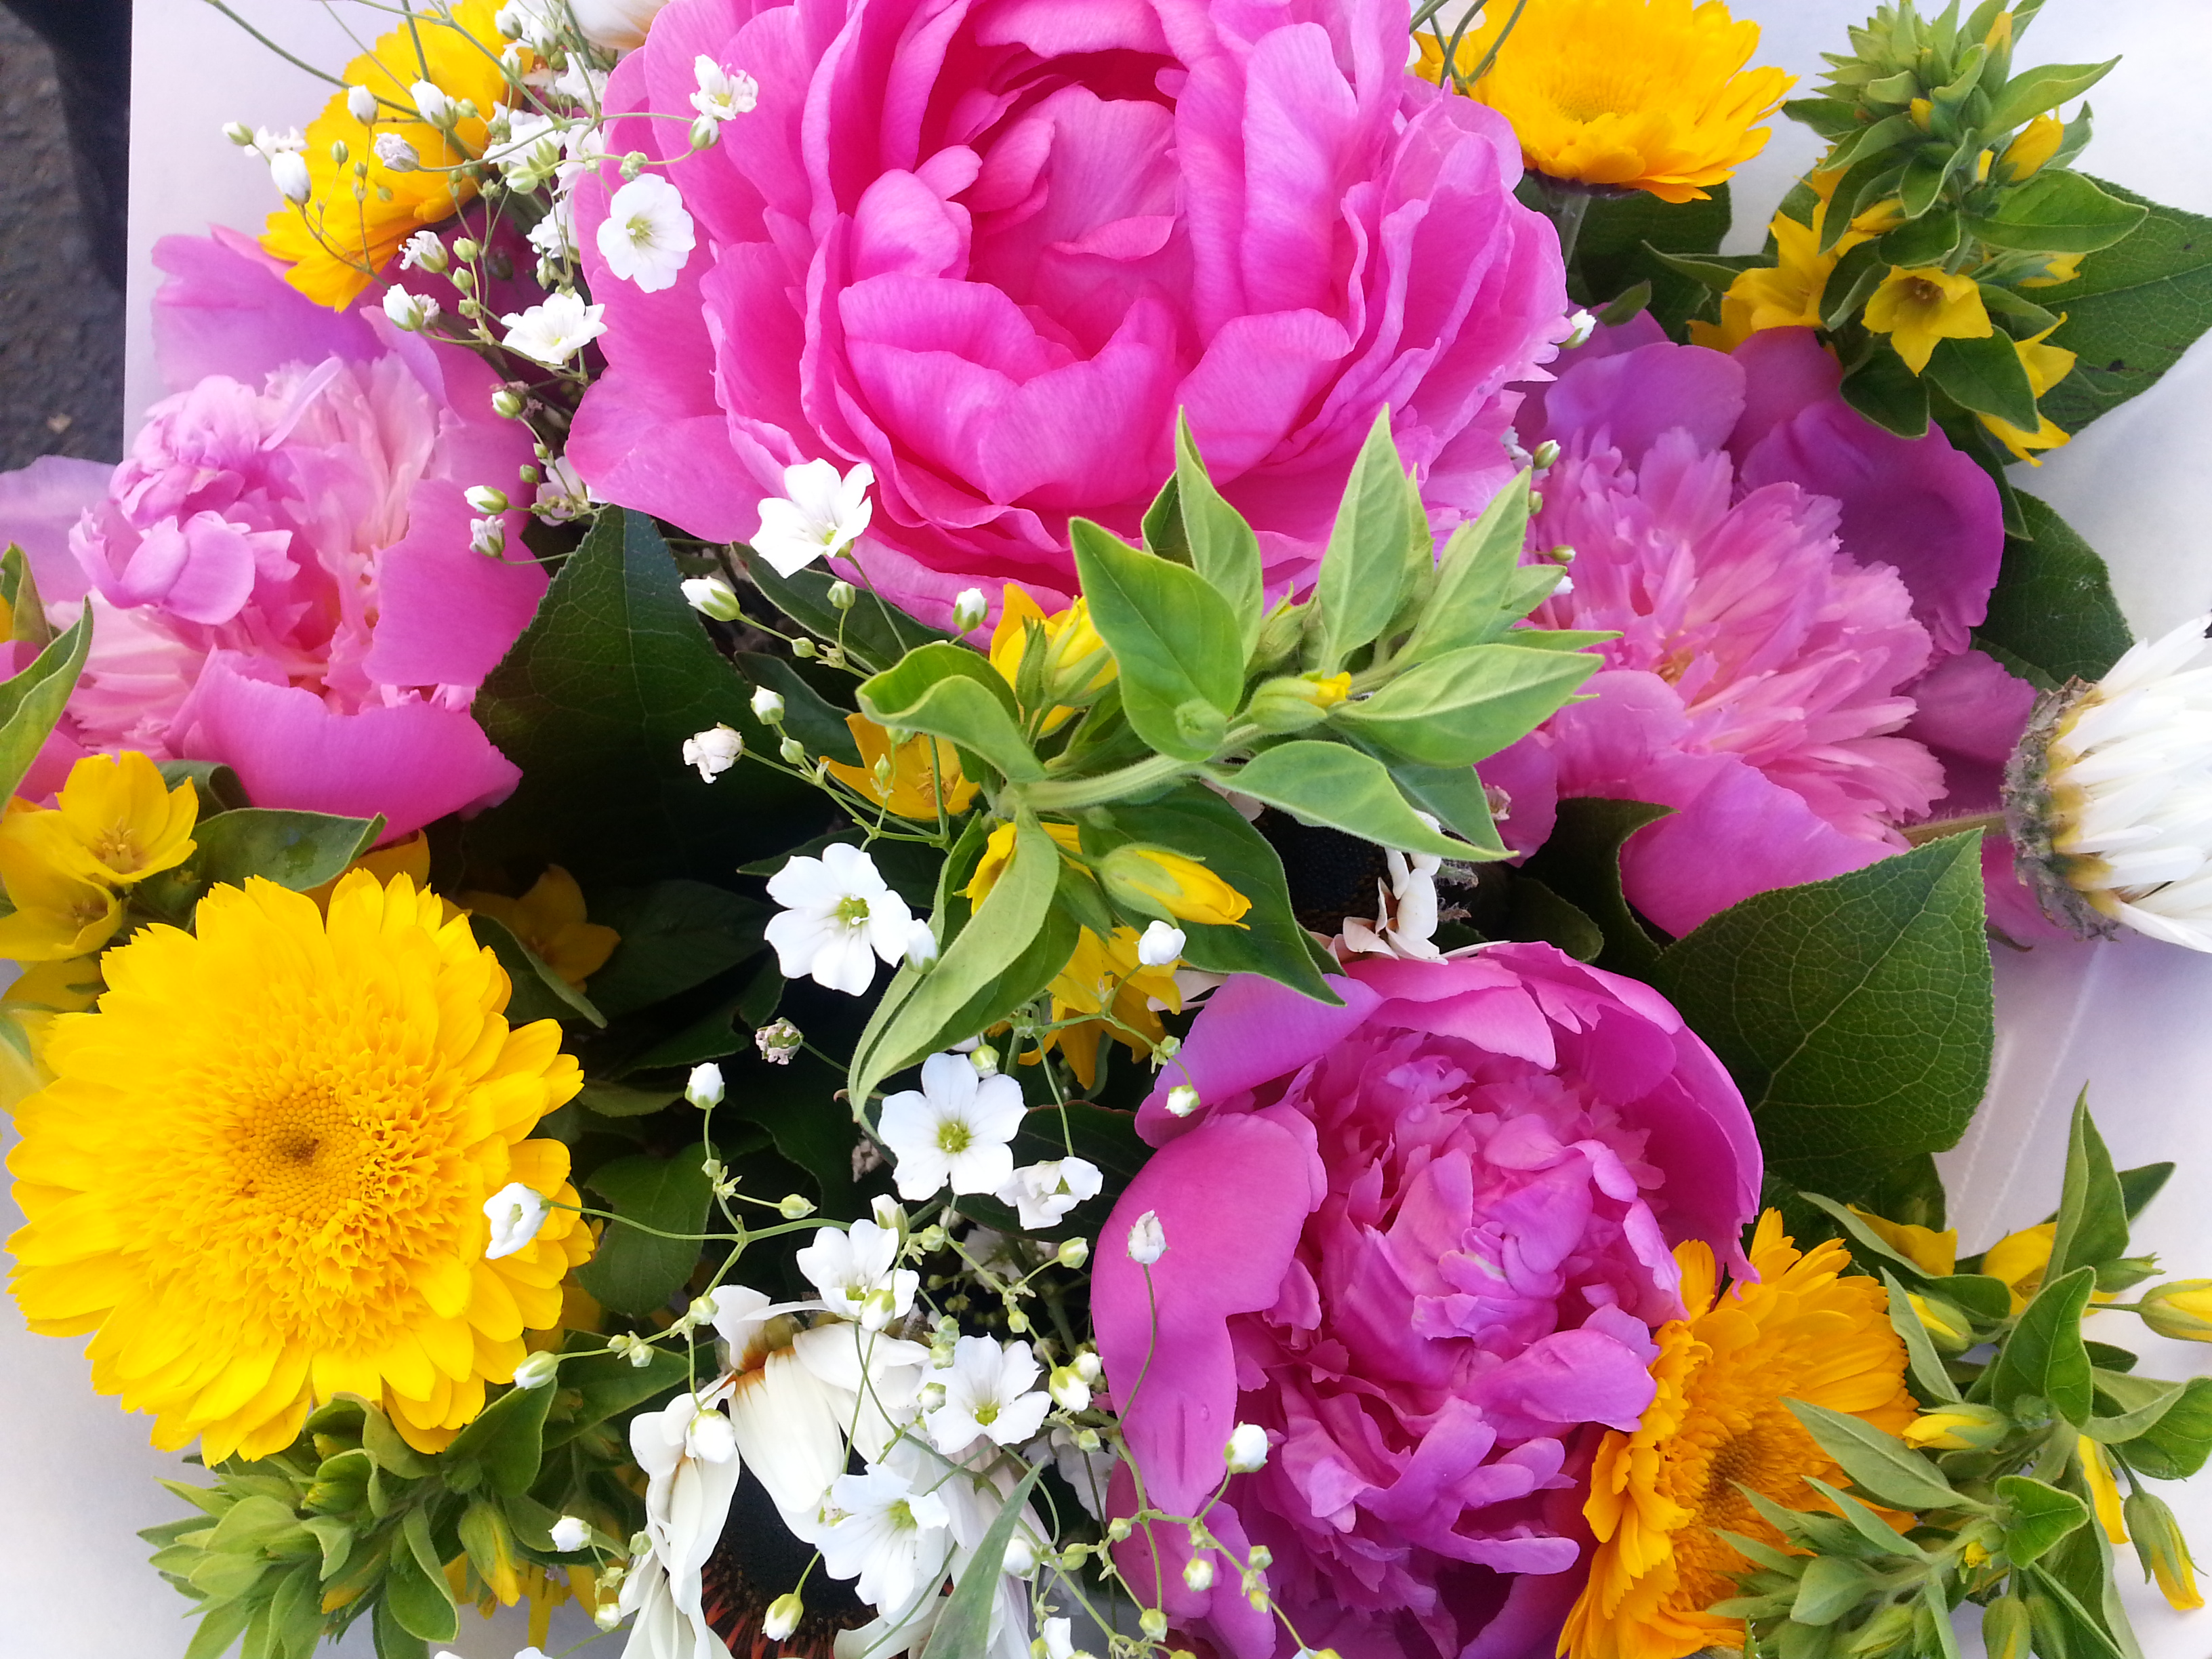 Big Bunch Of Flowers.